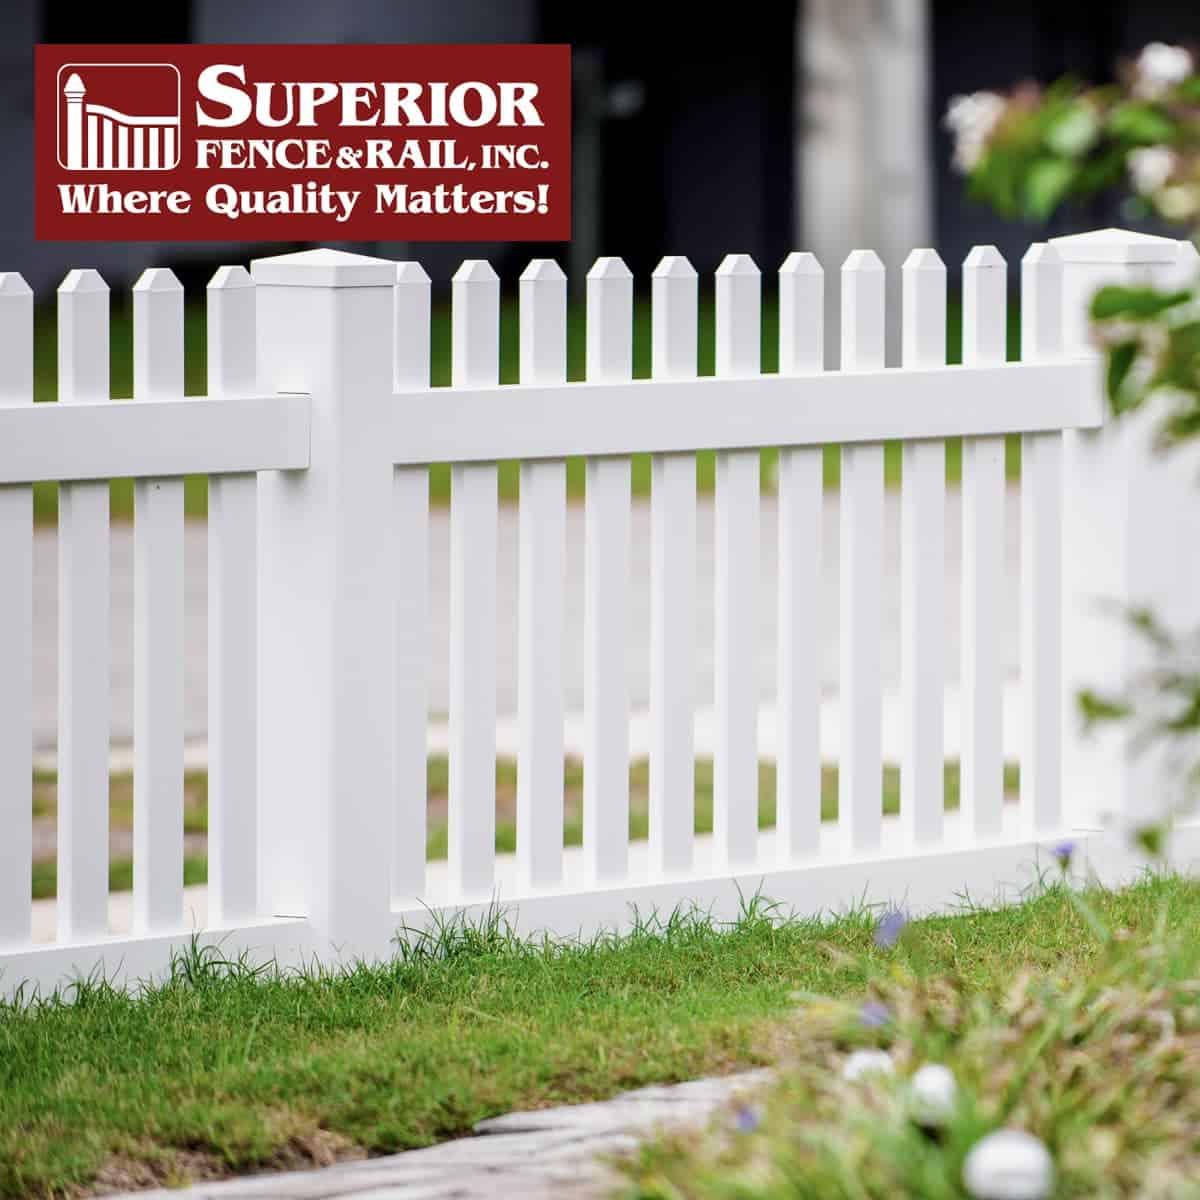 https://www.superiorfenceandrail.com/wp-content/uploads/2020/10/Jasper-Fence-Company-Contractor.jpg